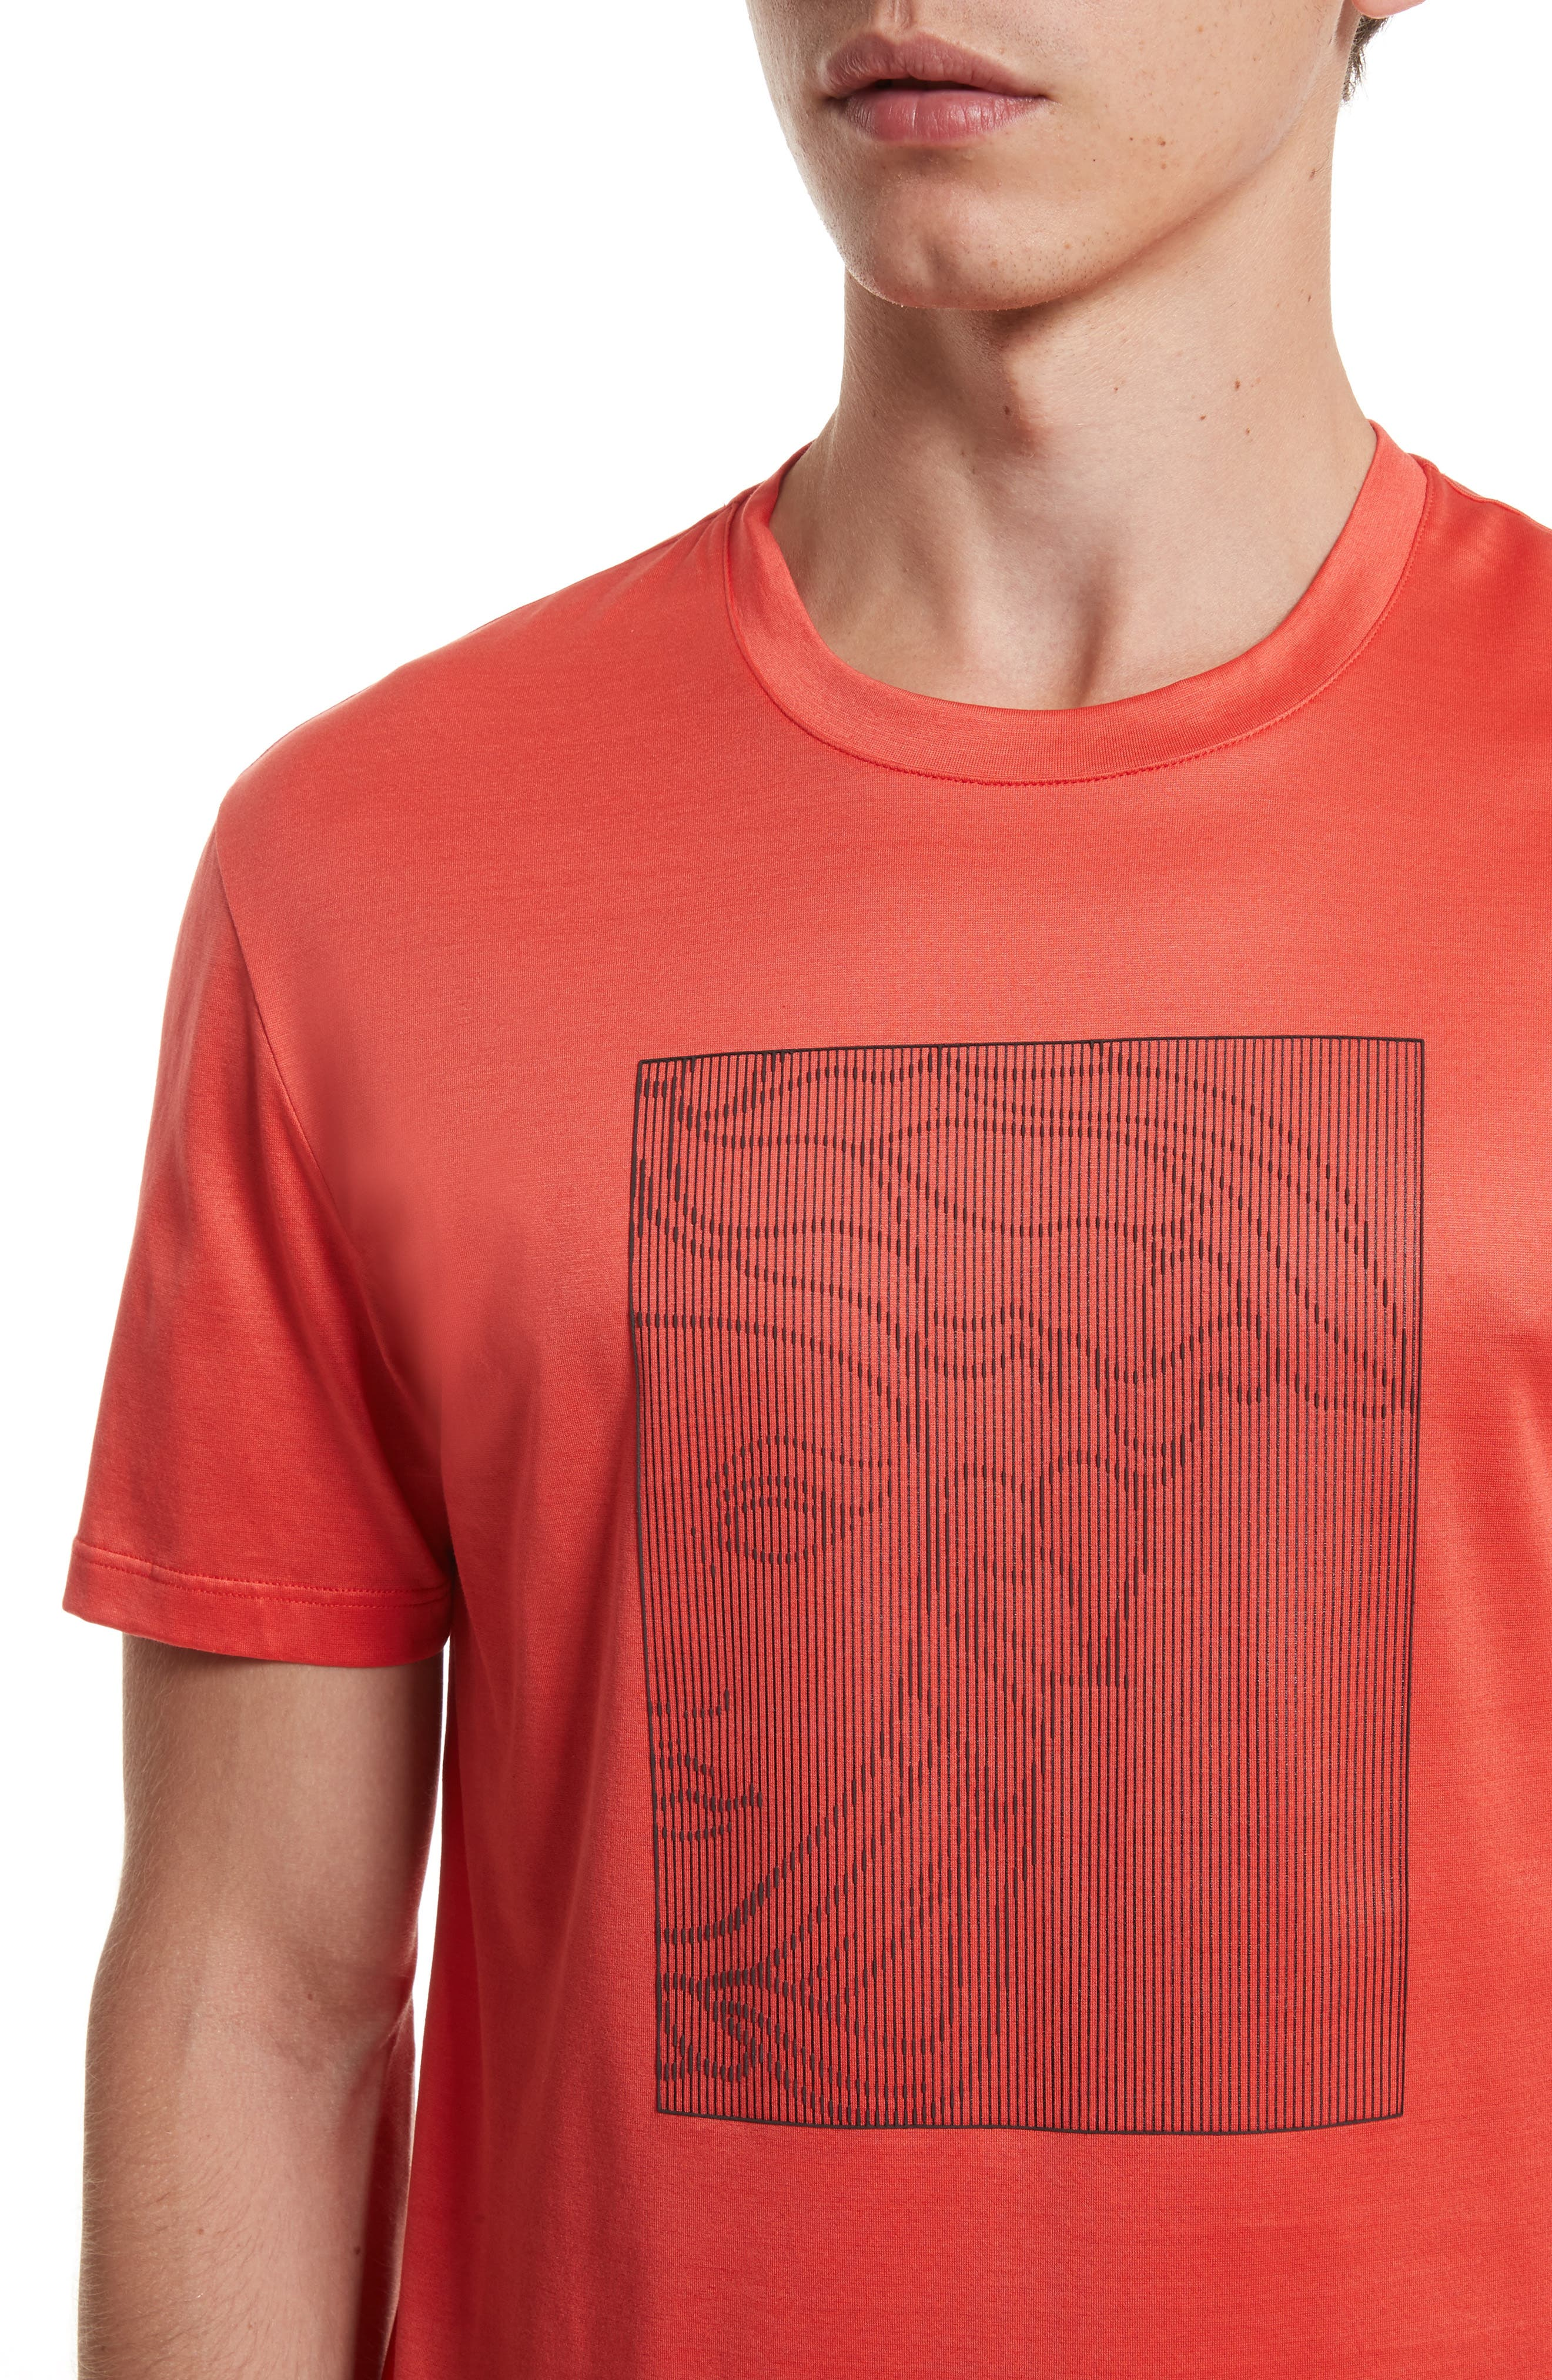 Barcode Medusa Graphic T-Shirt,                             Alternate thumbnail 4, color,                             600